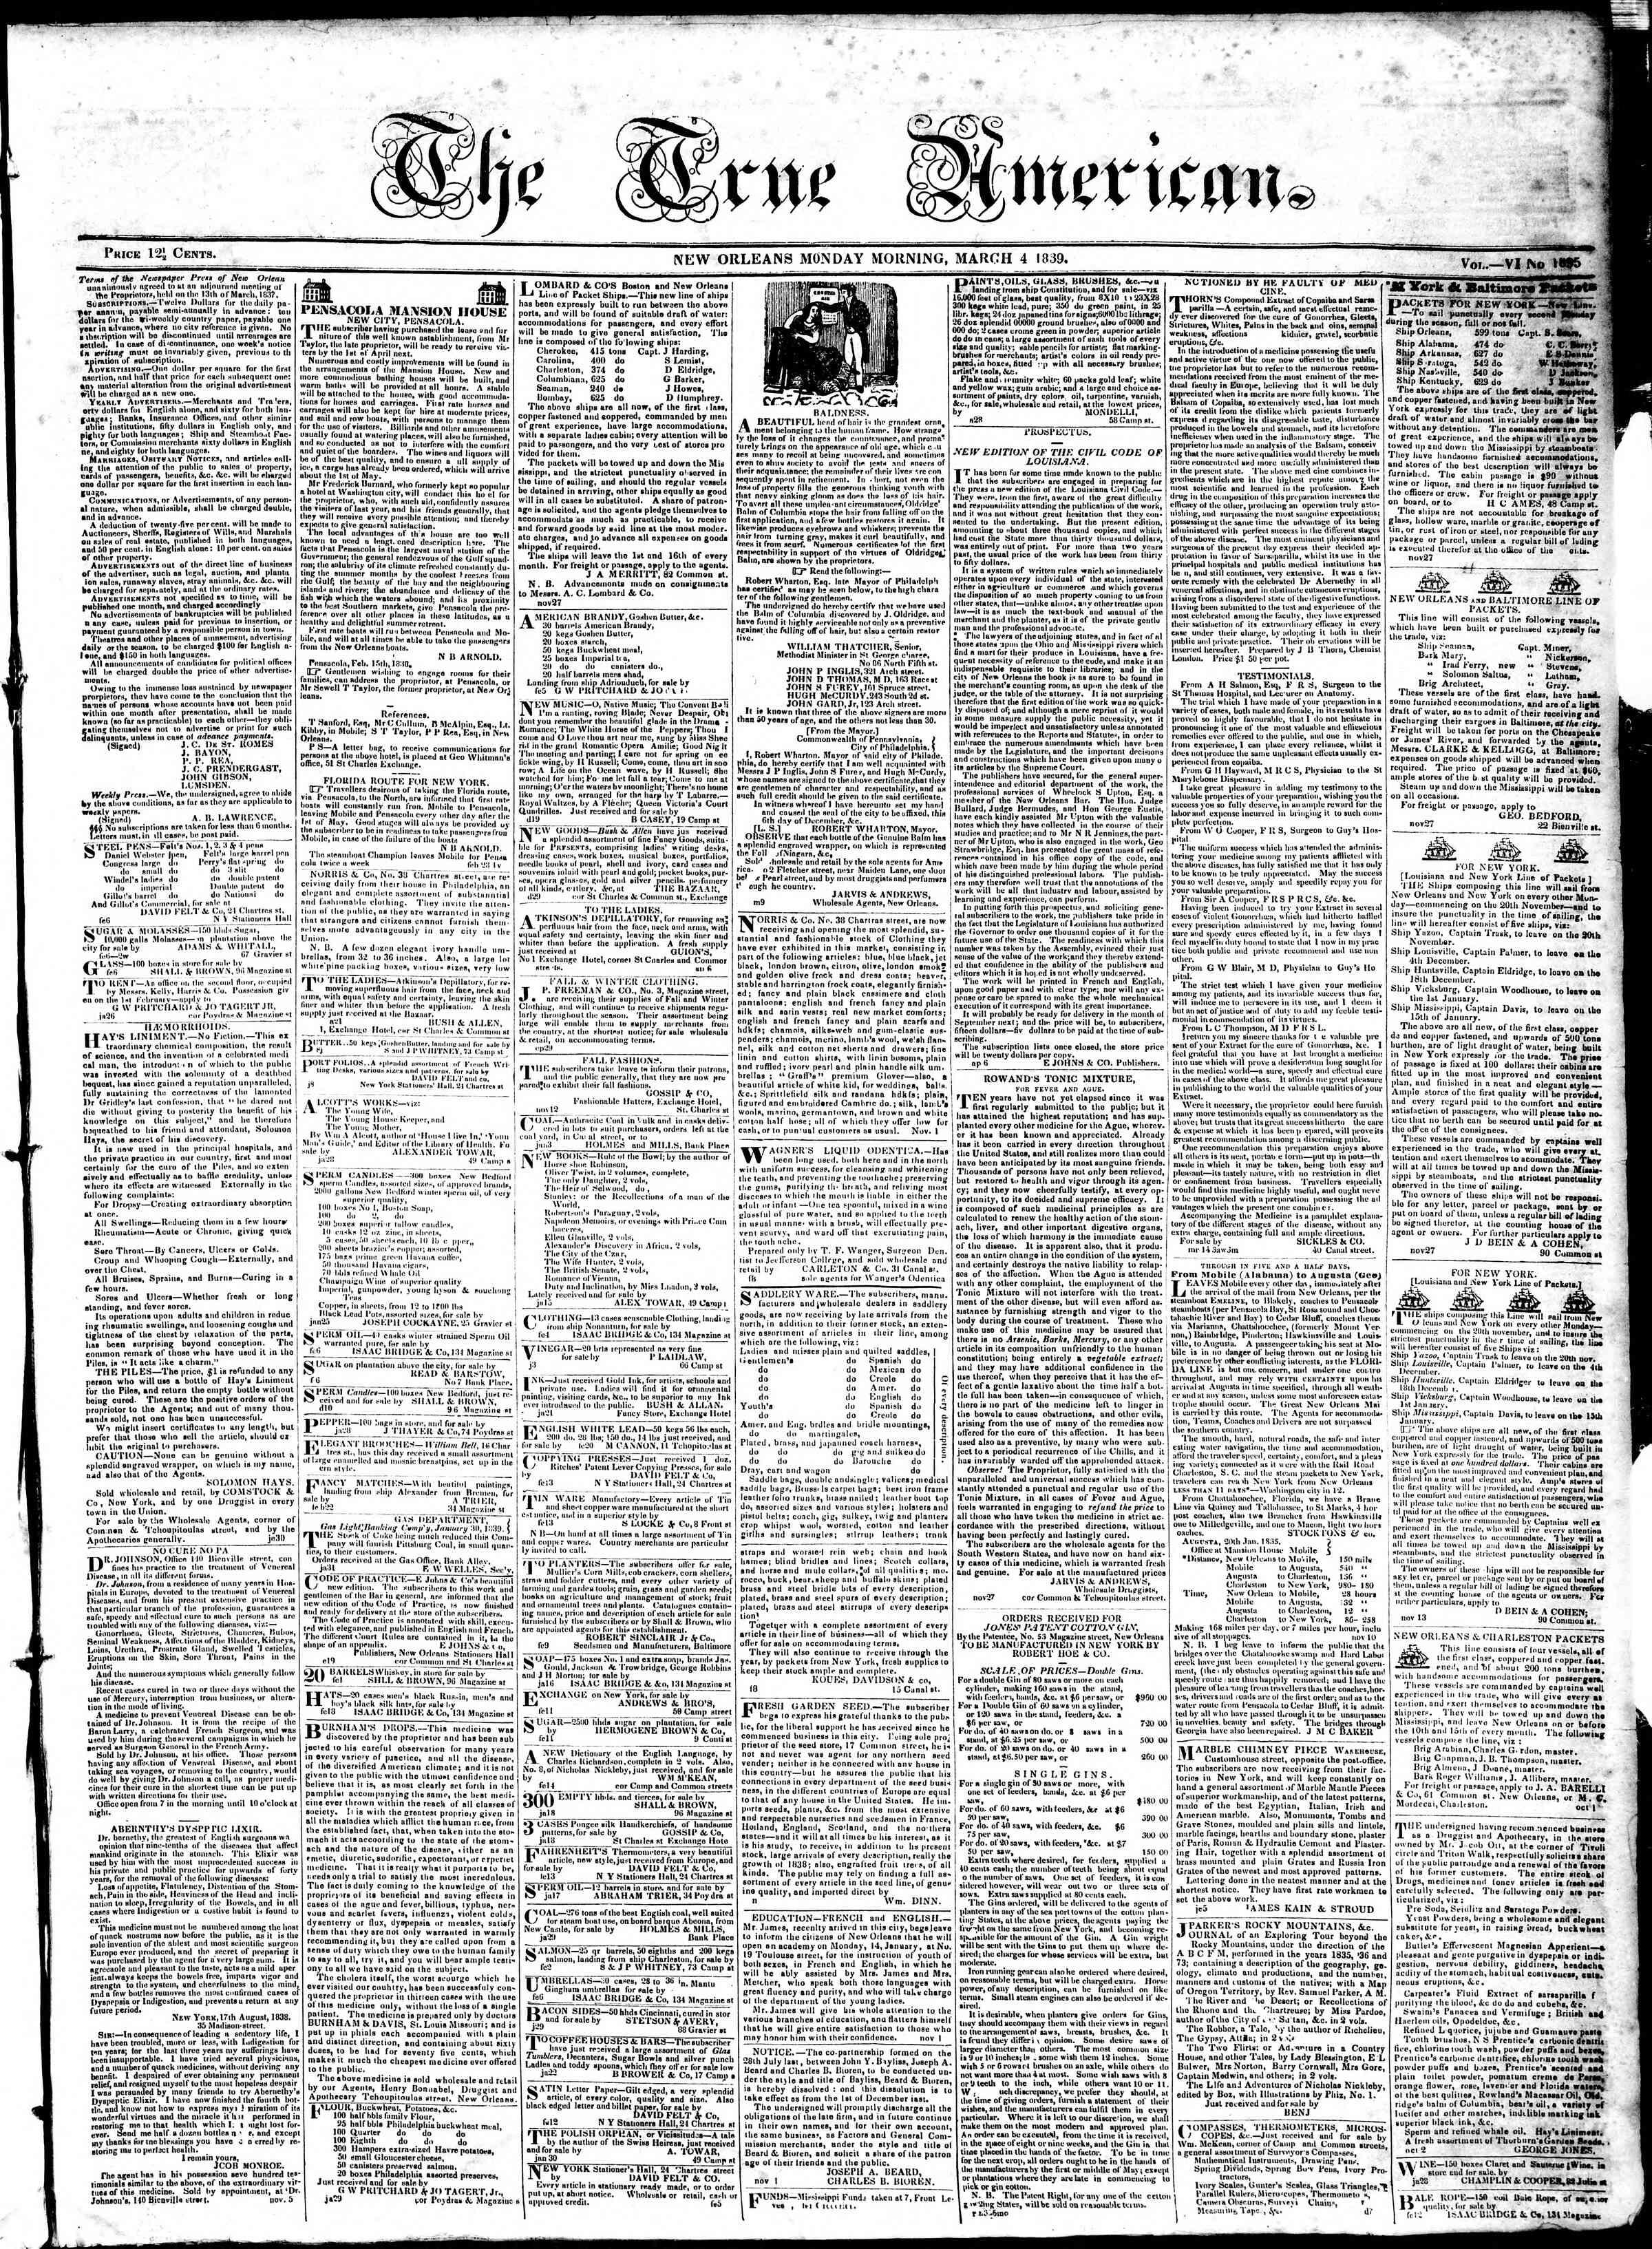 March 4, 1839 Tarihli True American Gazetesi Sayfa 1